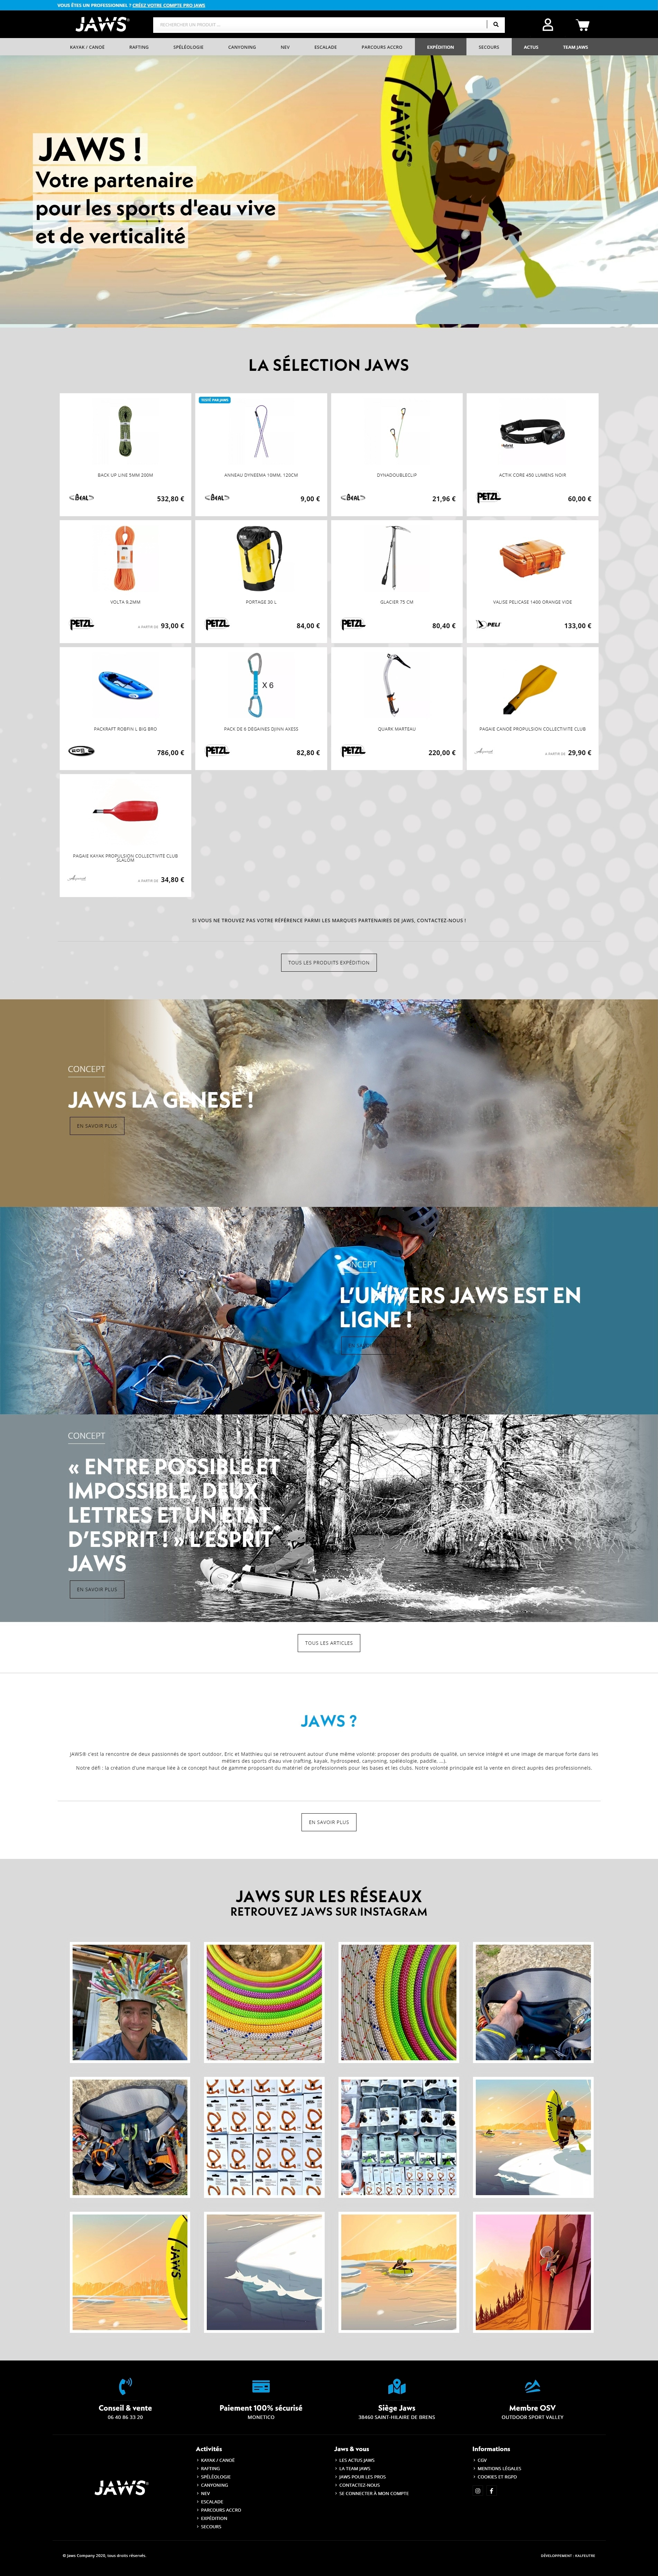 projet jaws company - kalfeutre, webdesigner lyon